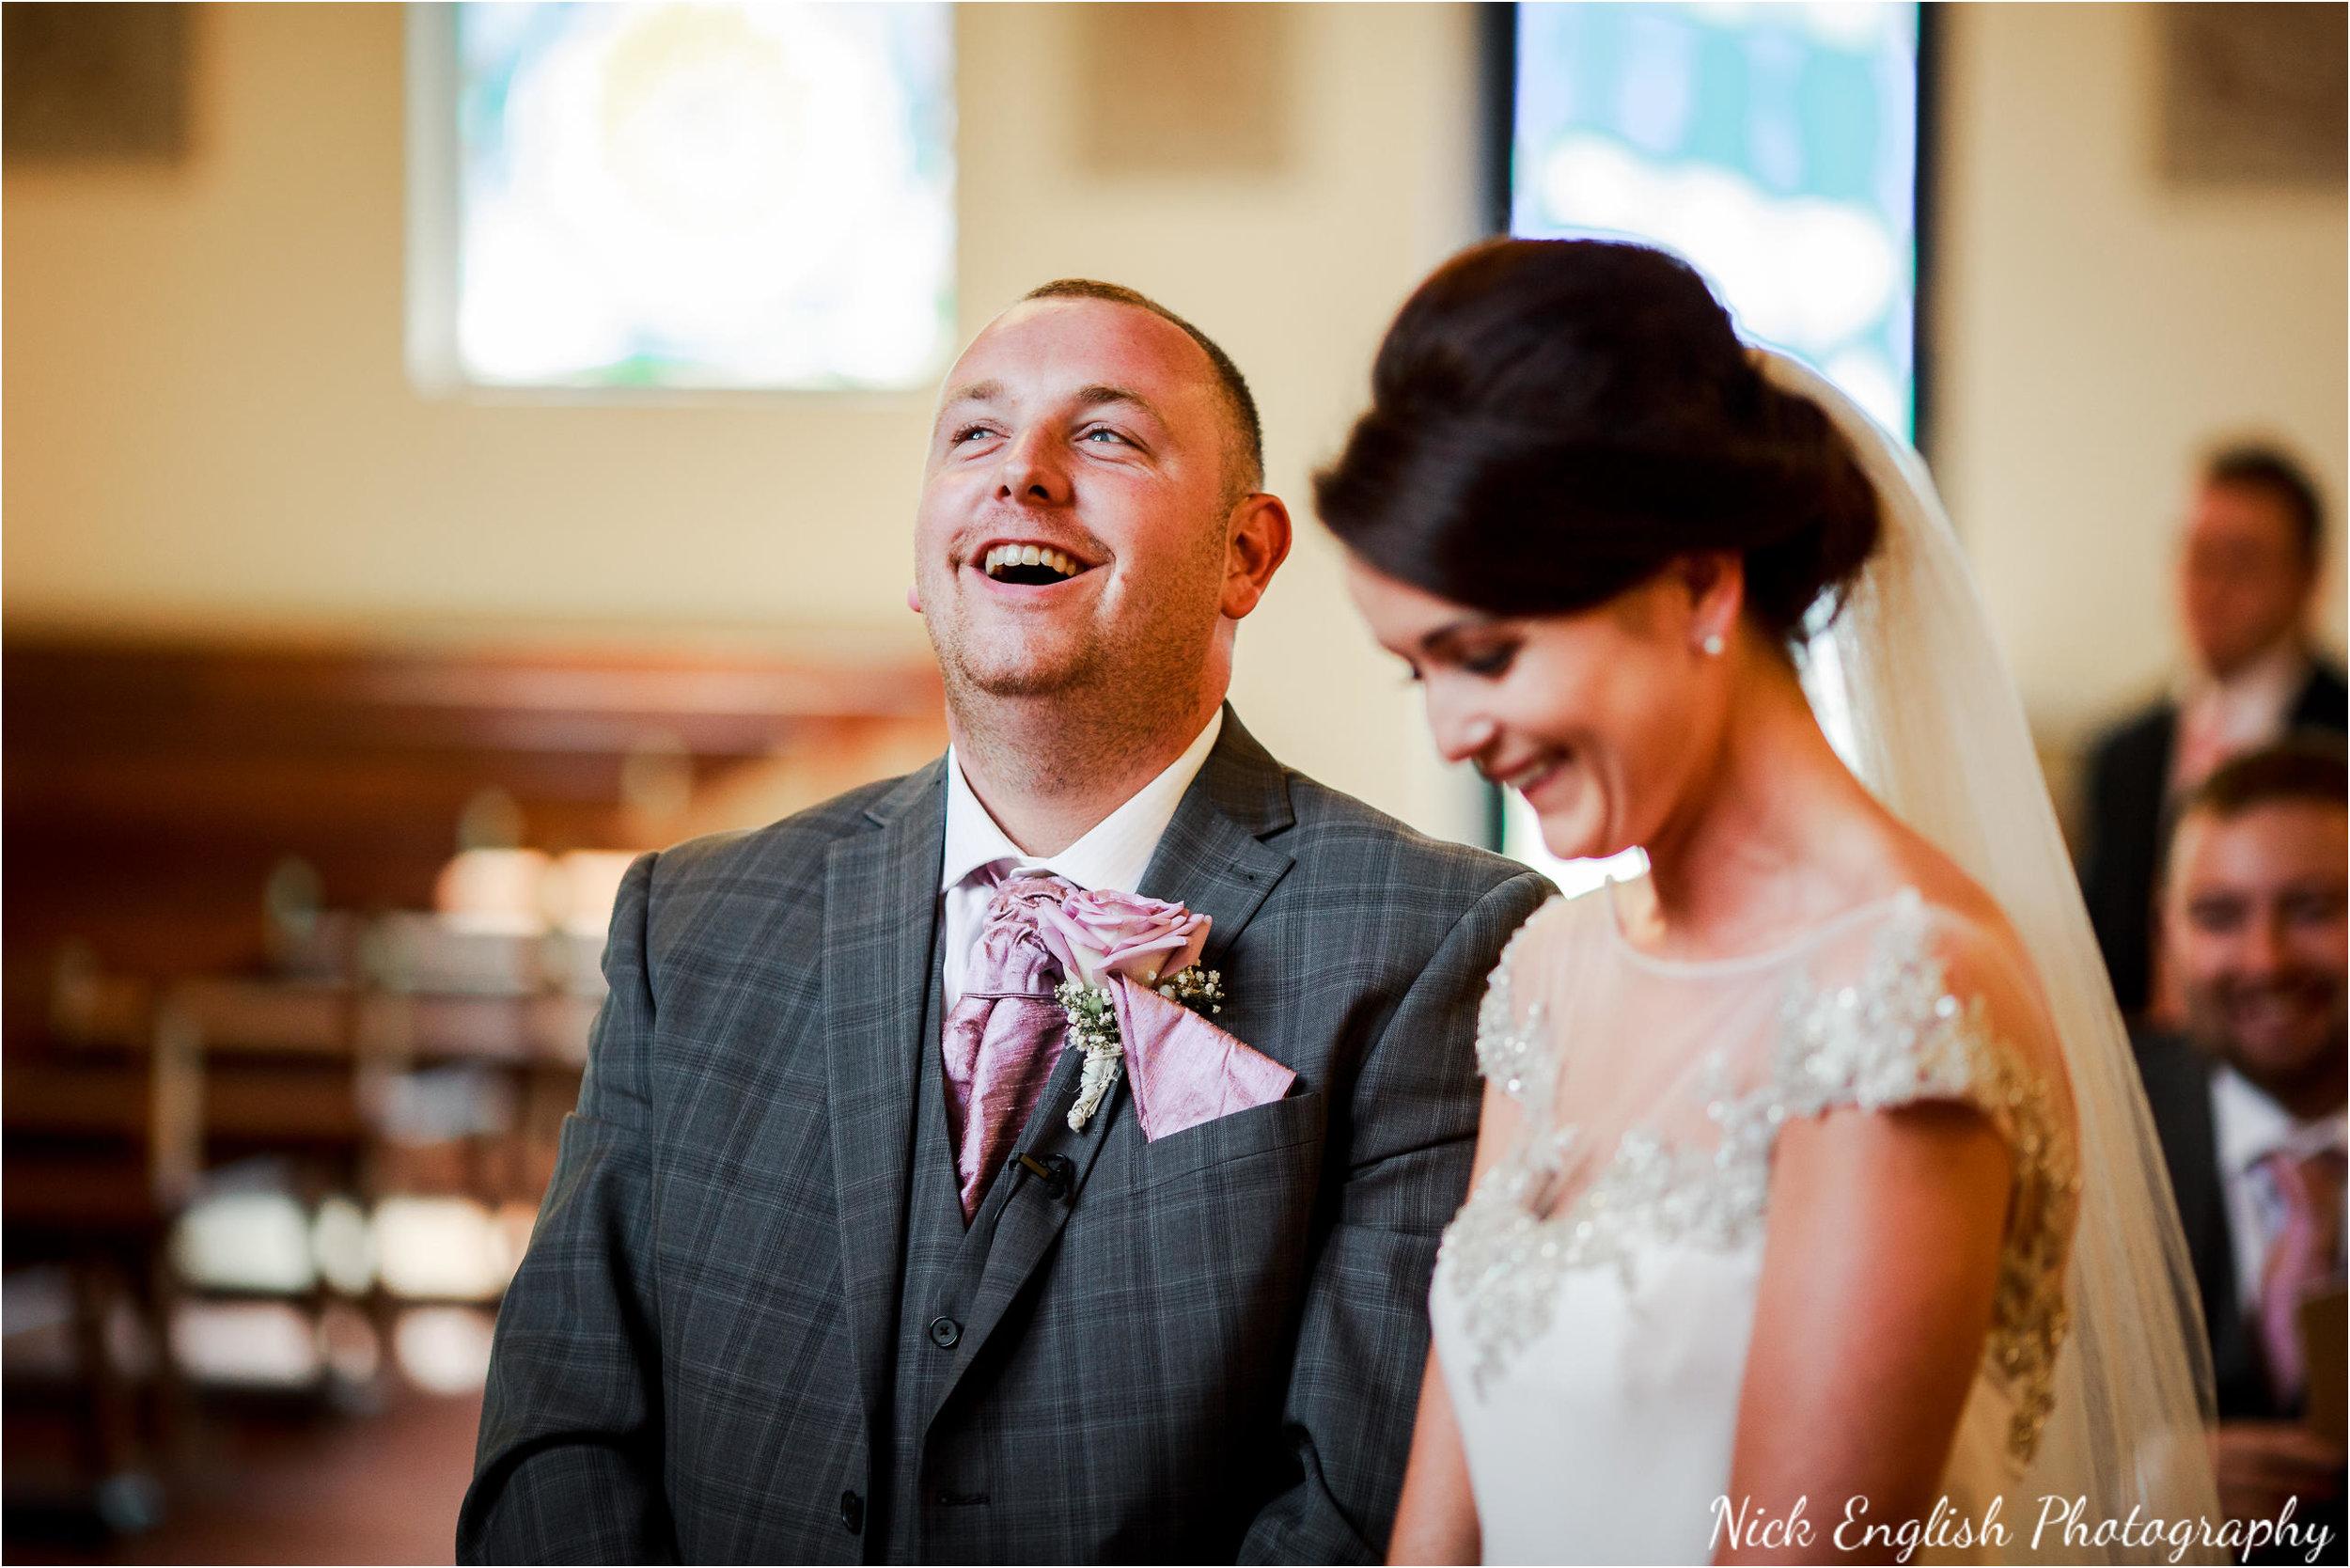 Stacey-Ash-Wedding-Photographs-Stanley-House-Preston-Lancashire-59.jpg